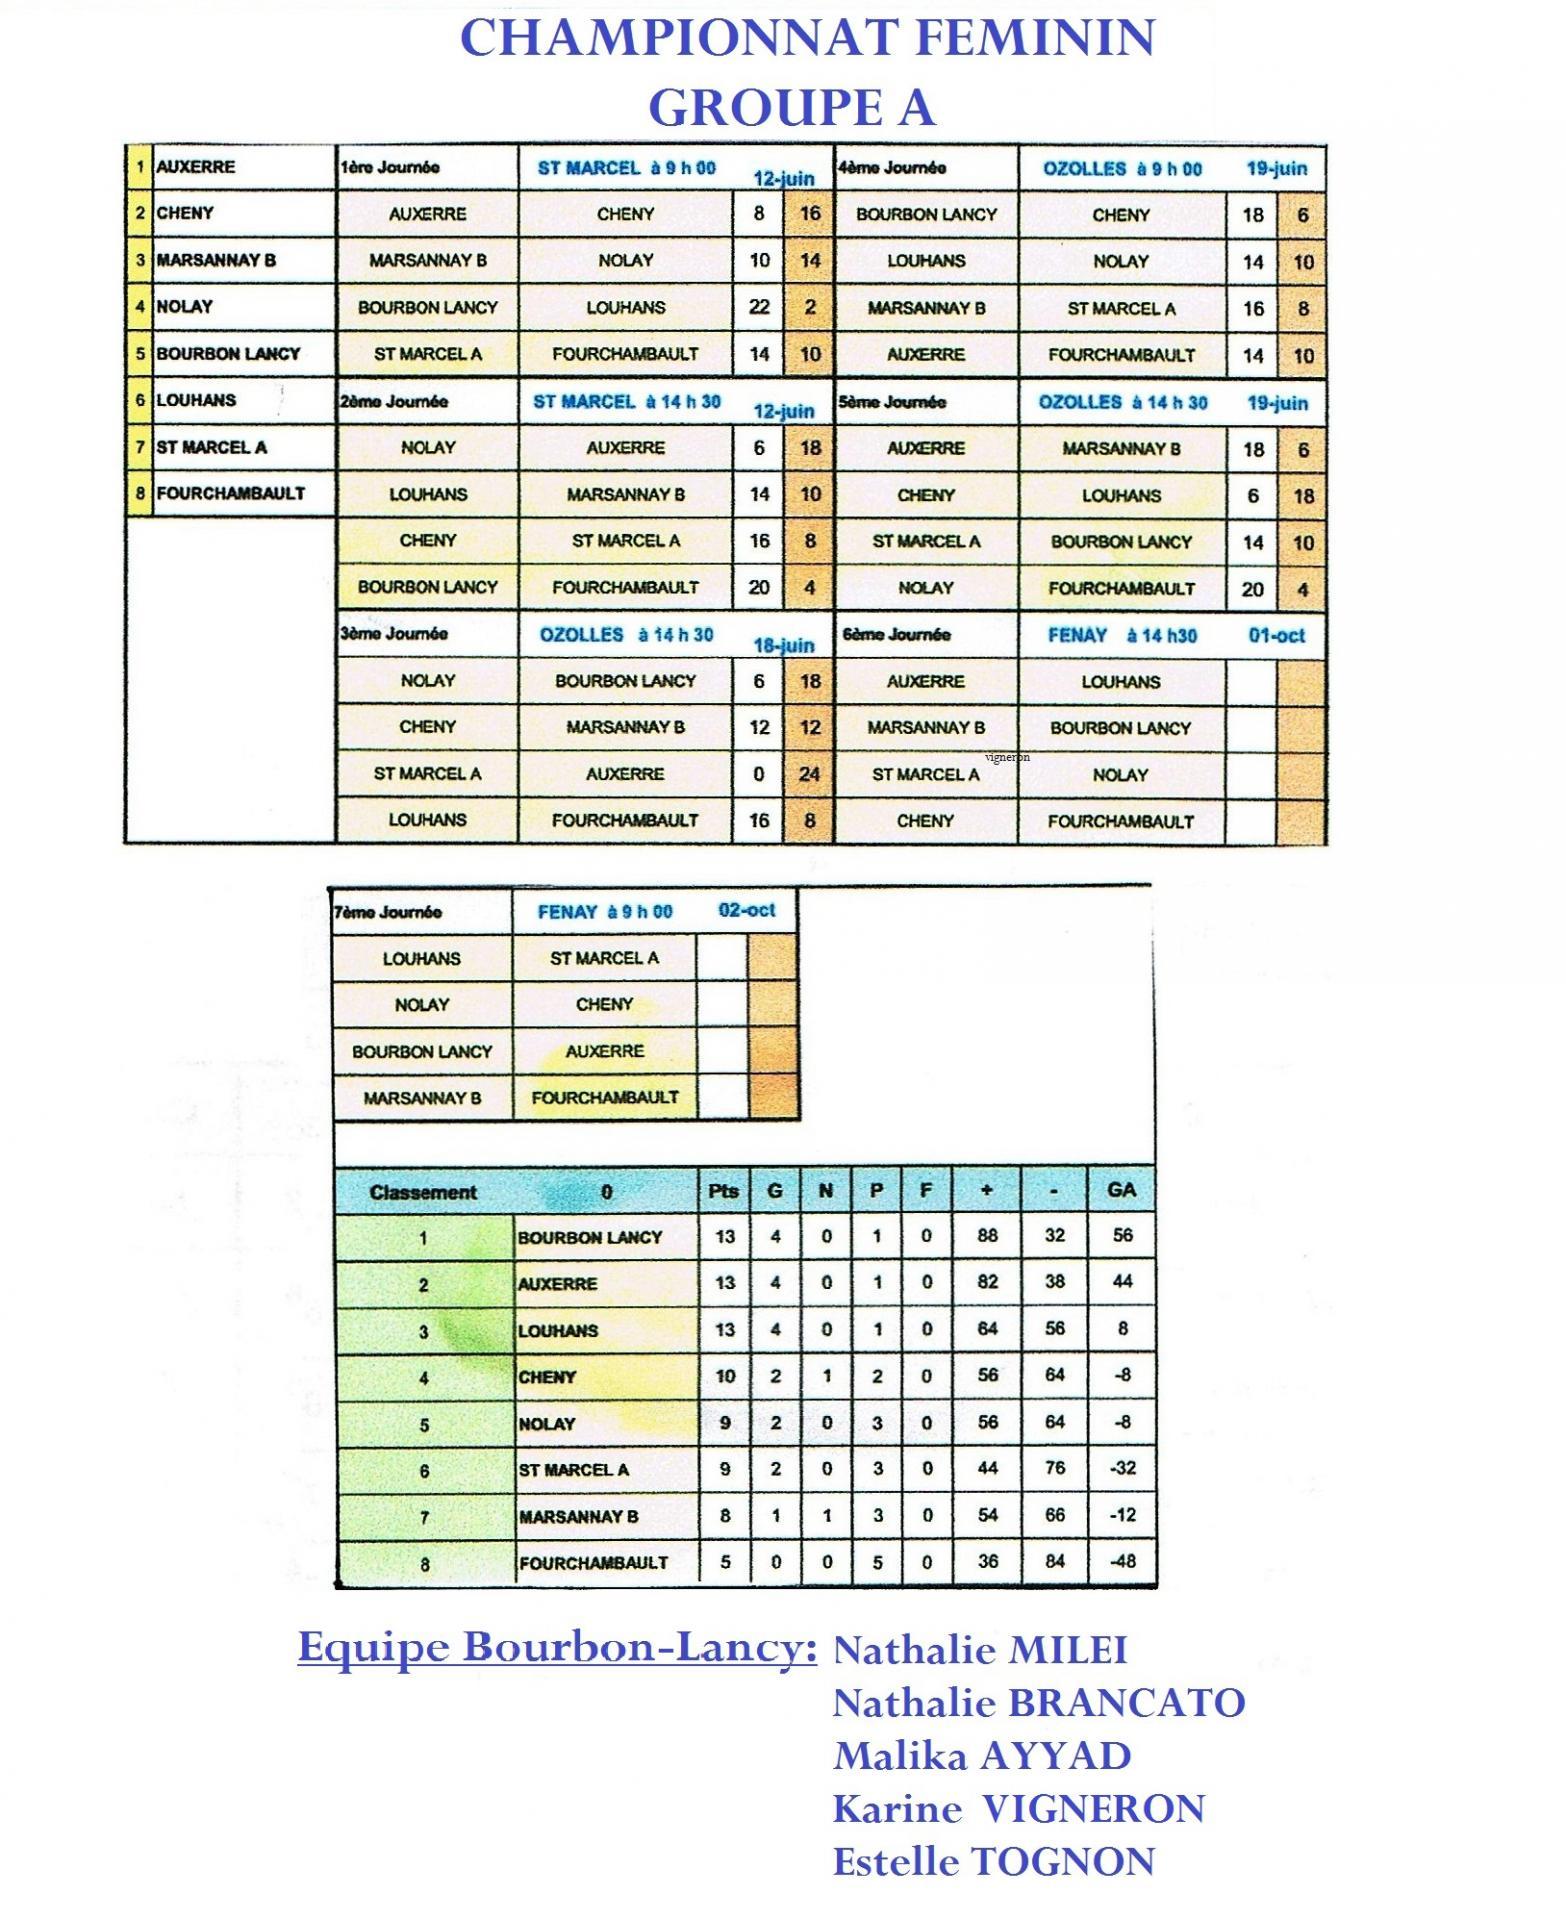 Championnat feminin 1